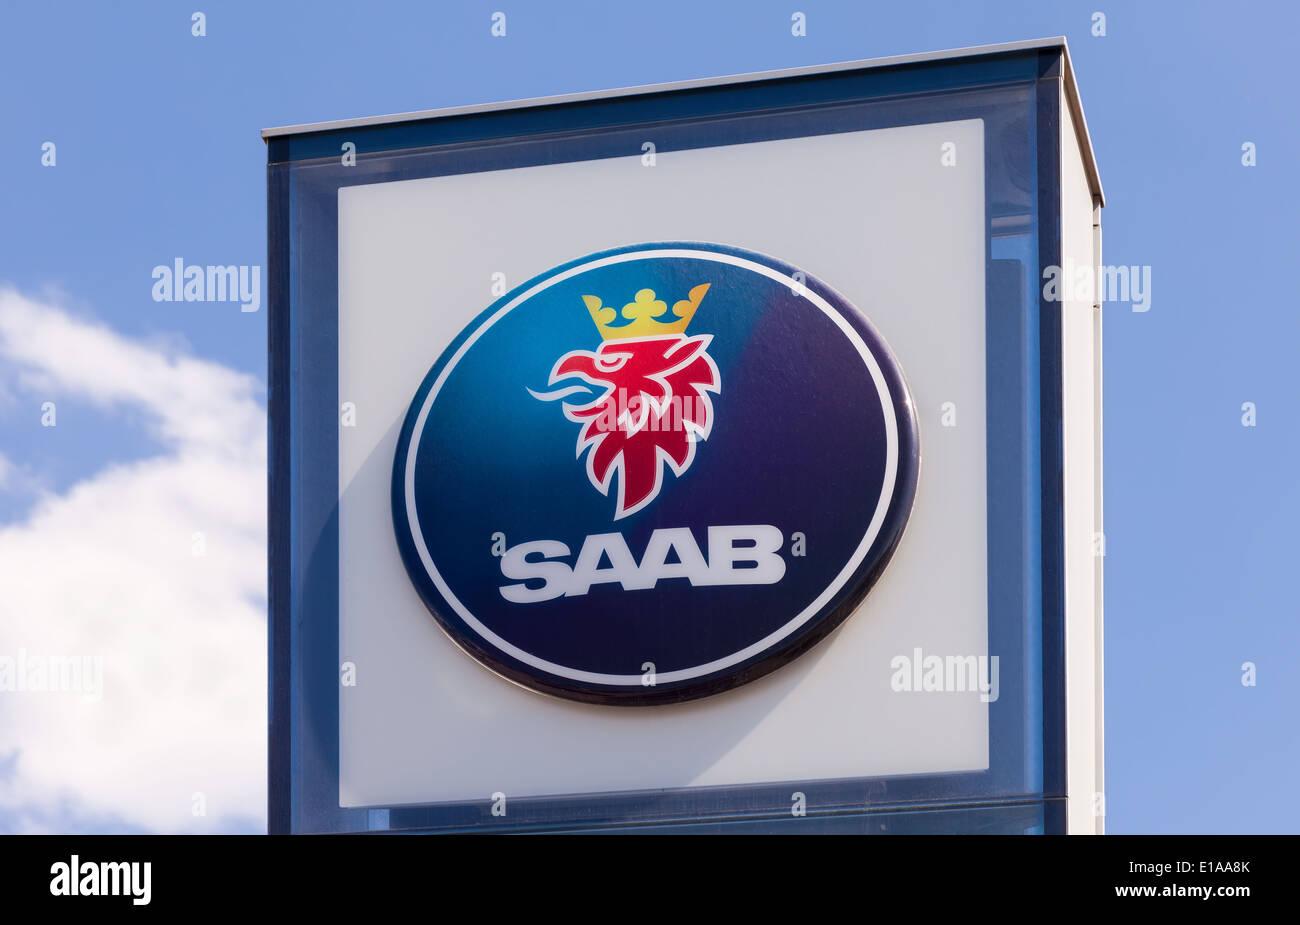 The emblem SAAB dealer car automaker brand trade sky motor over blue sky - Stock Image